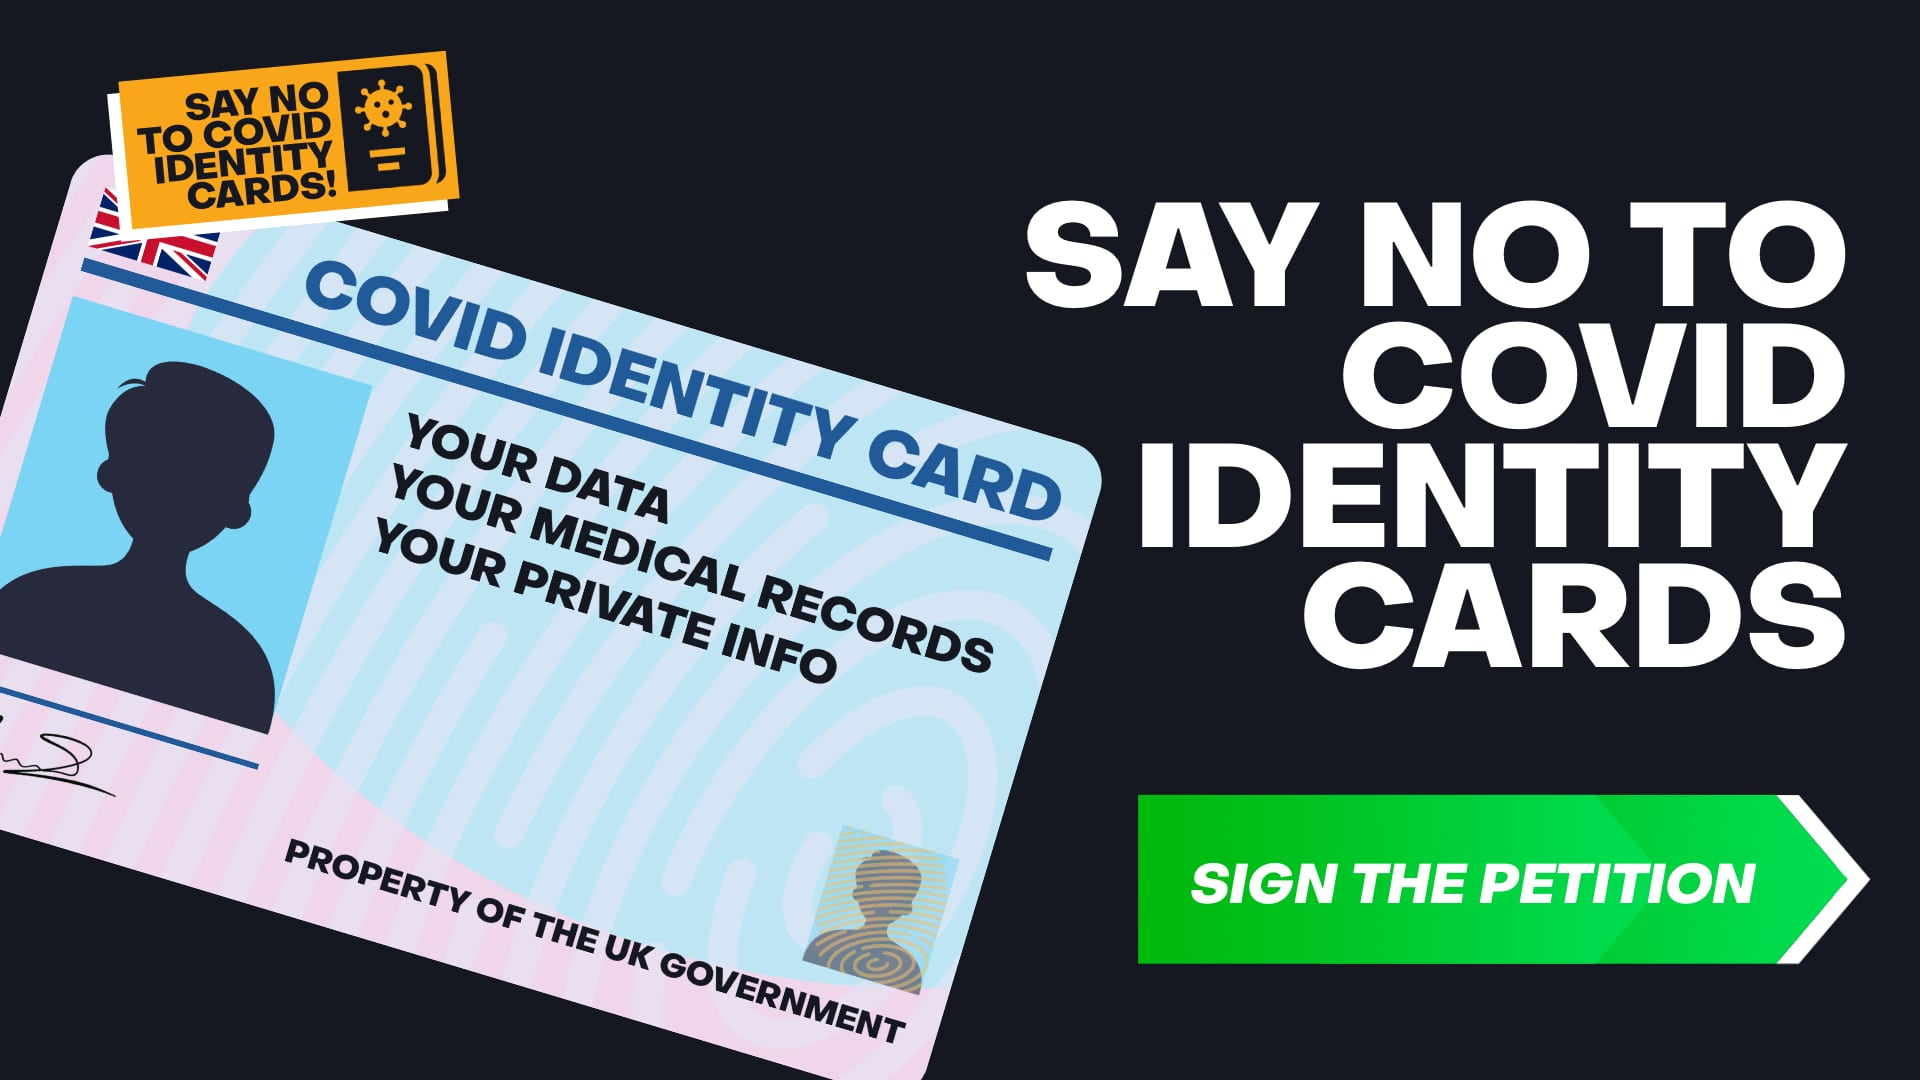 No to COVID Identity Cards!